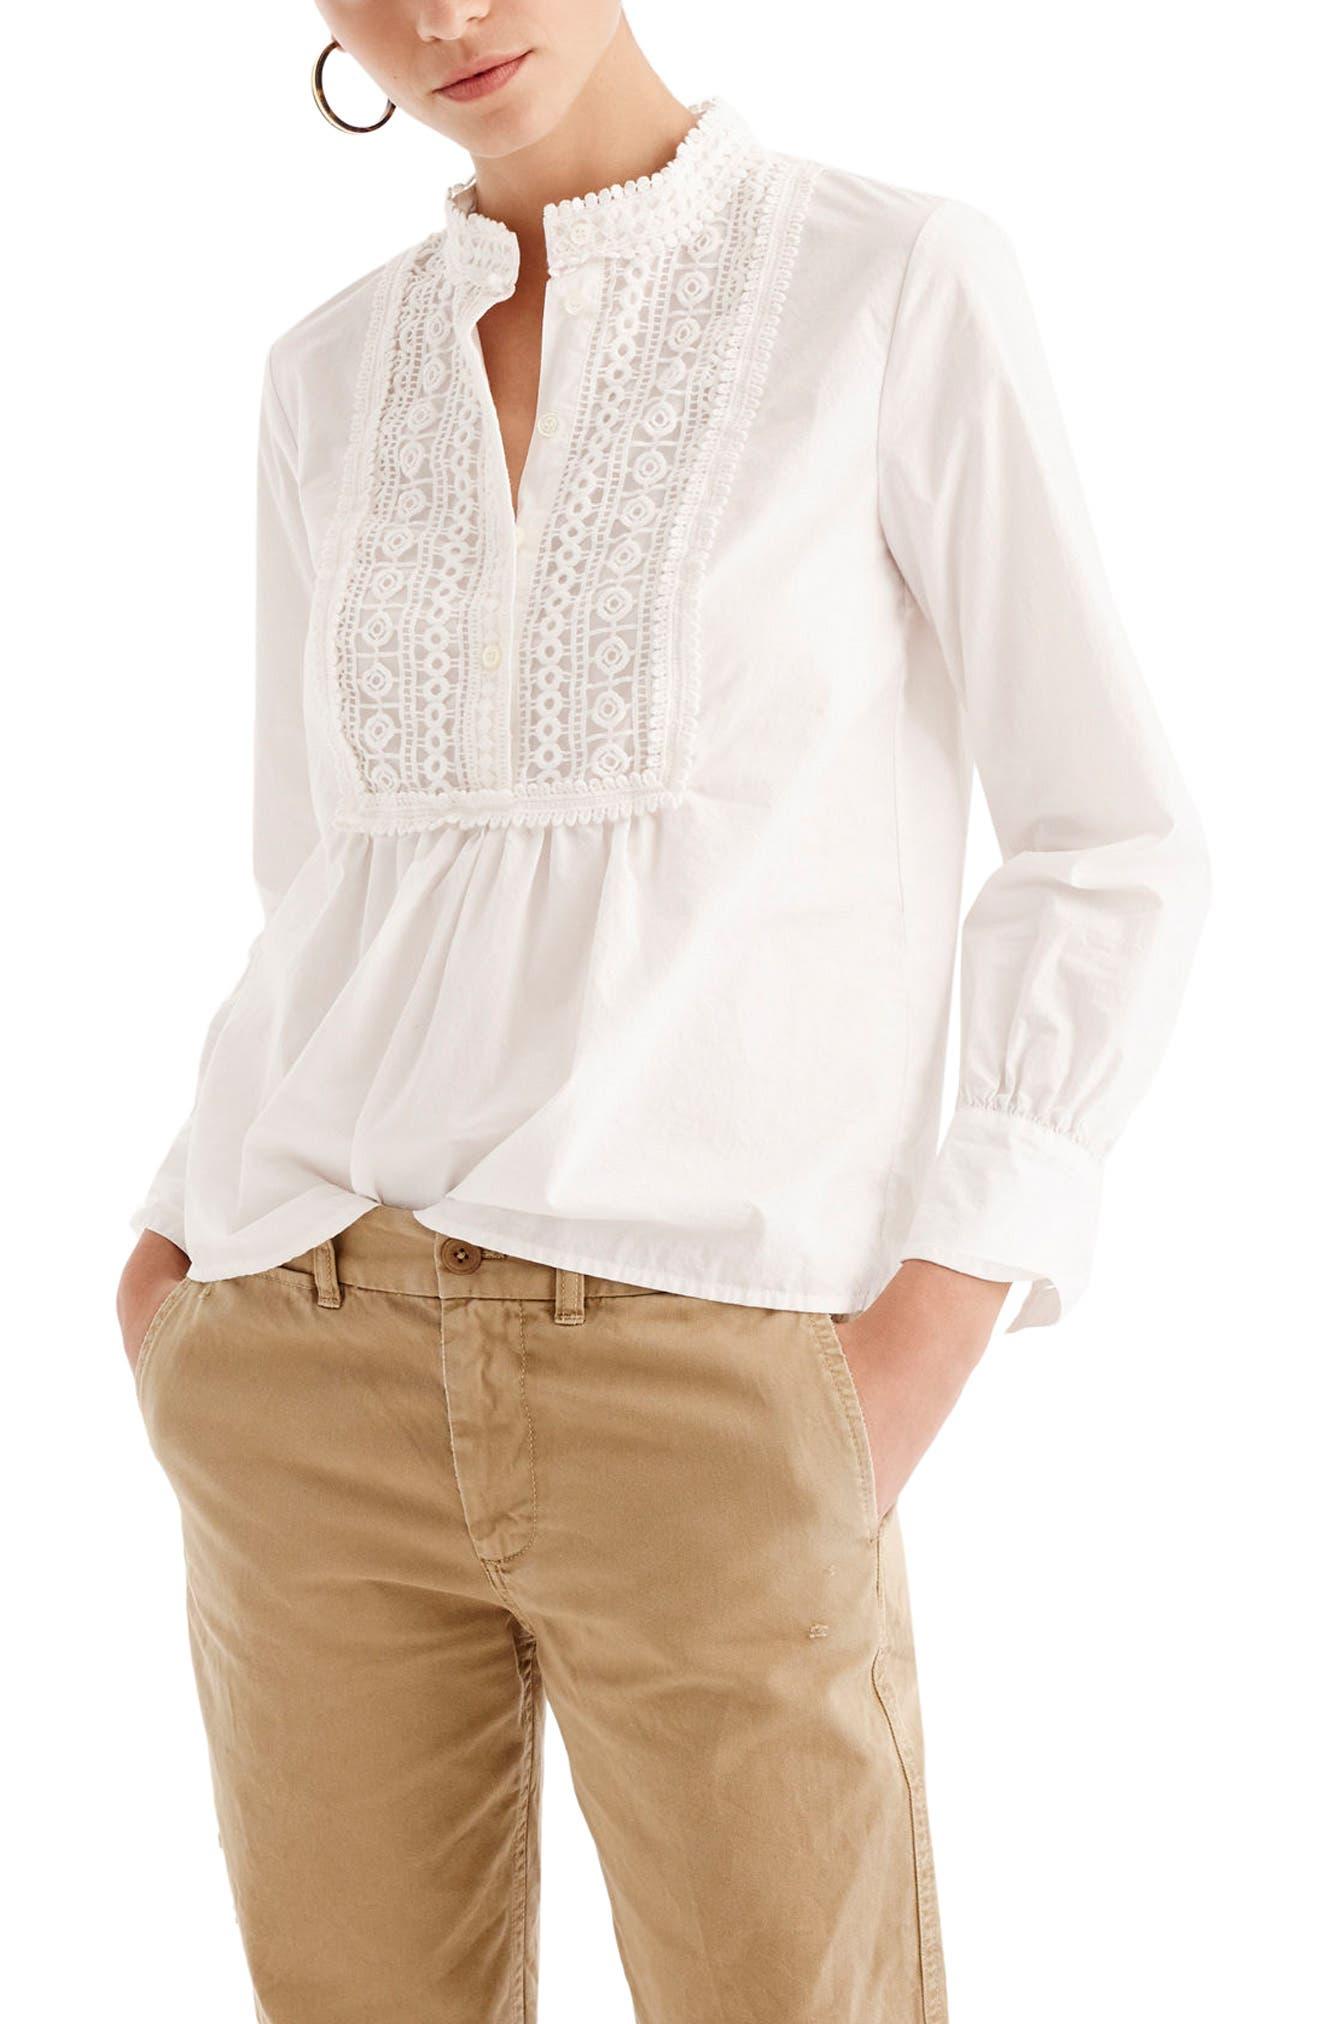 Main Image - J.Crew Lace Bib Popover Shirt (Regular & Petite)